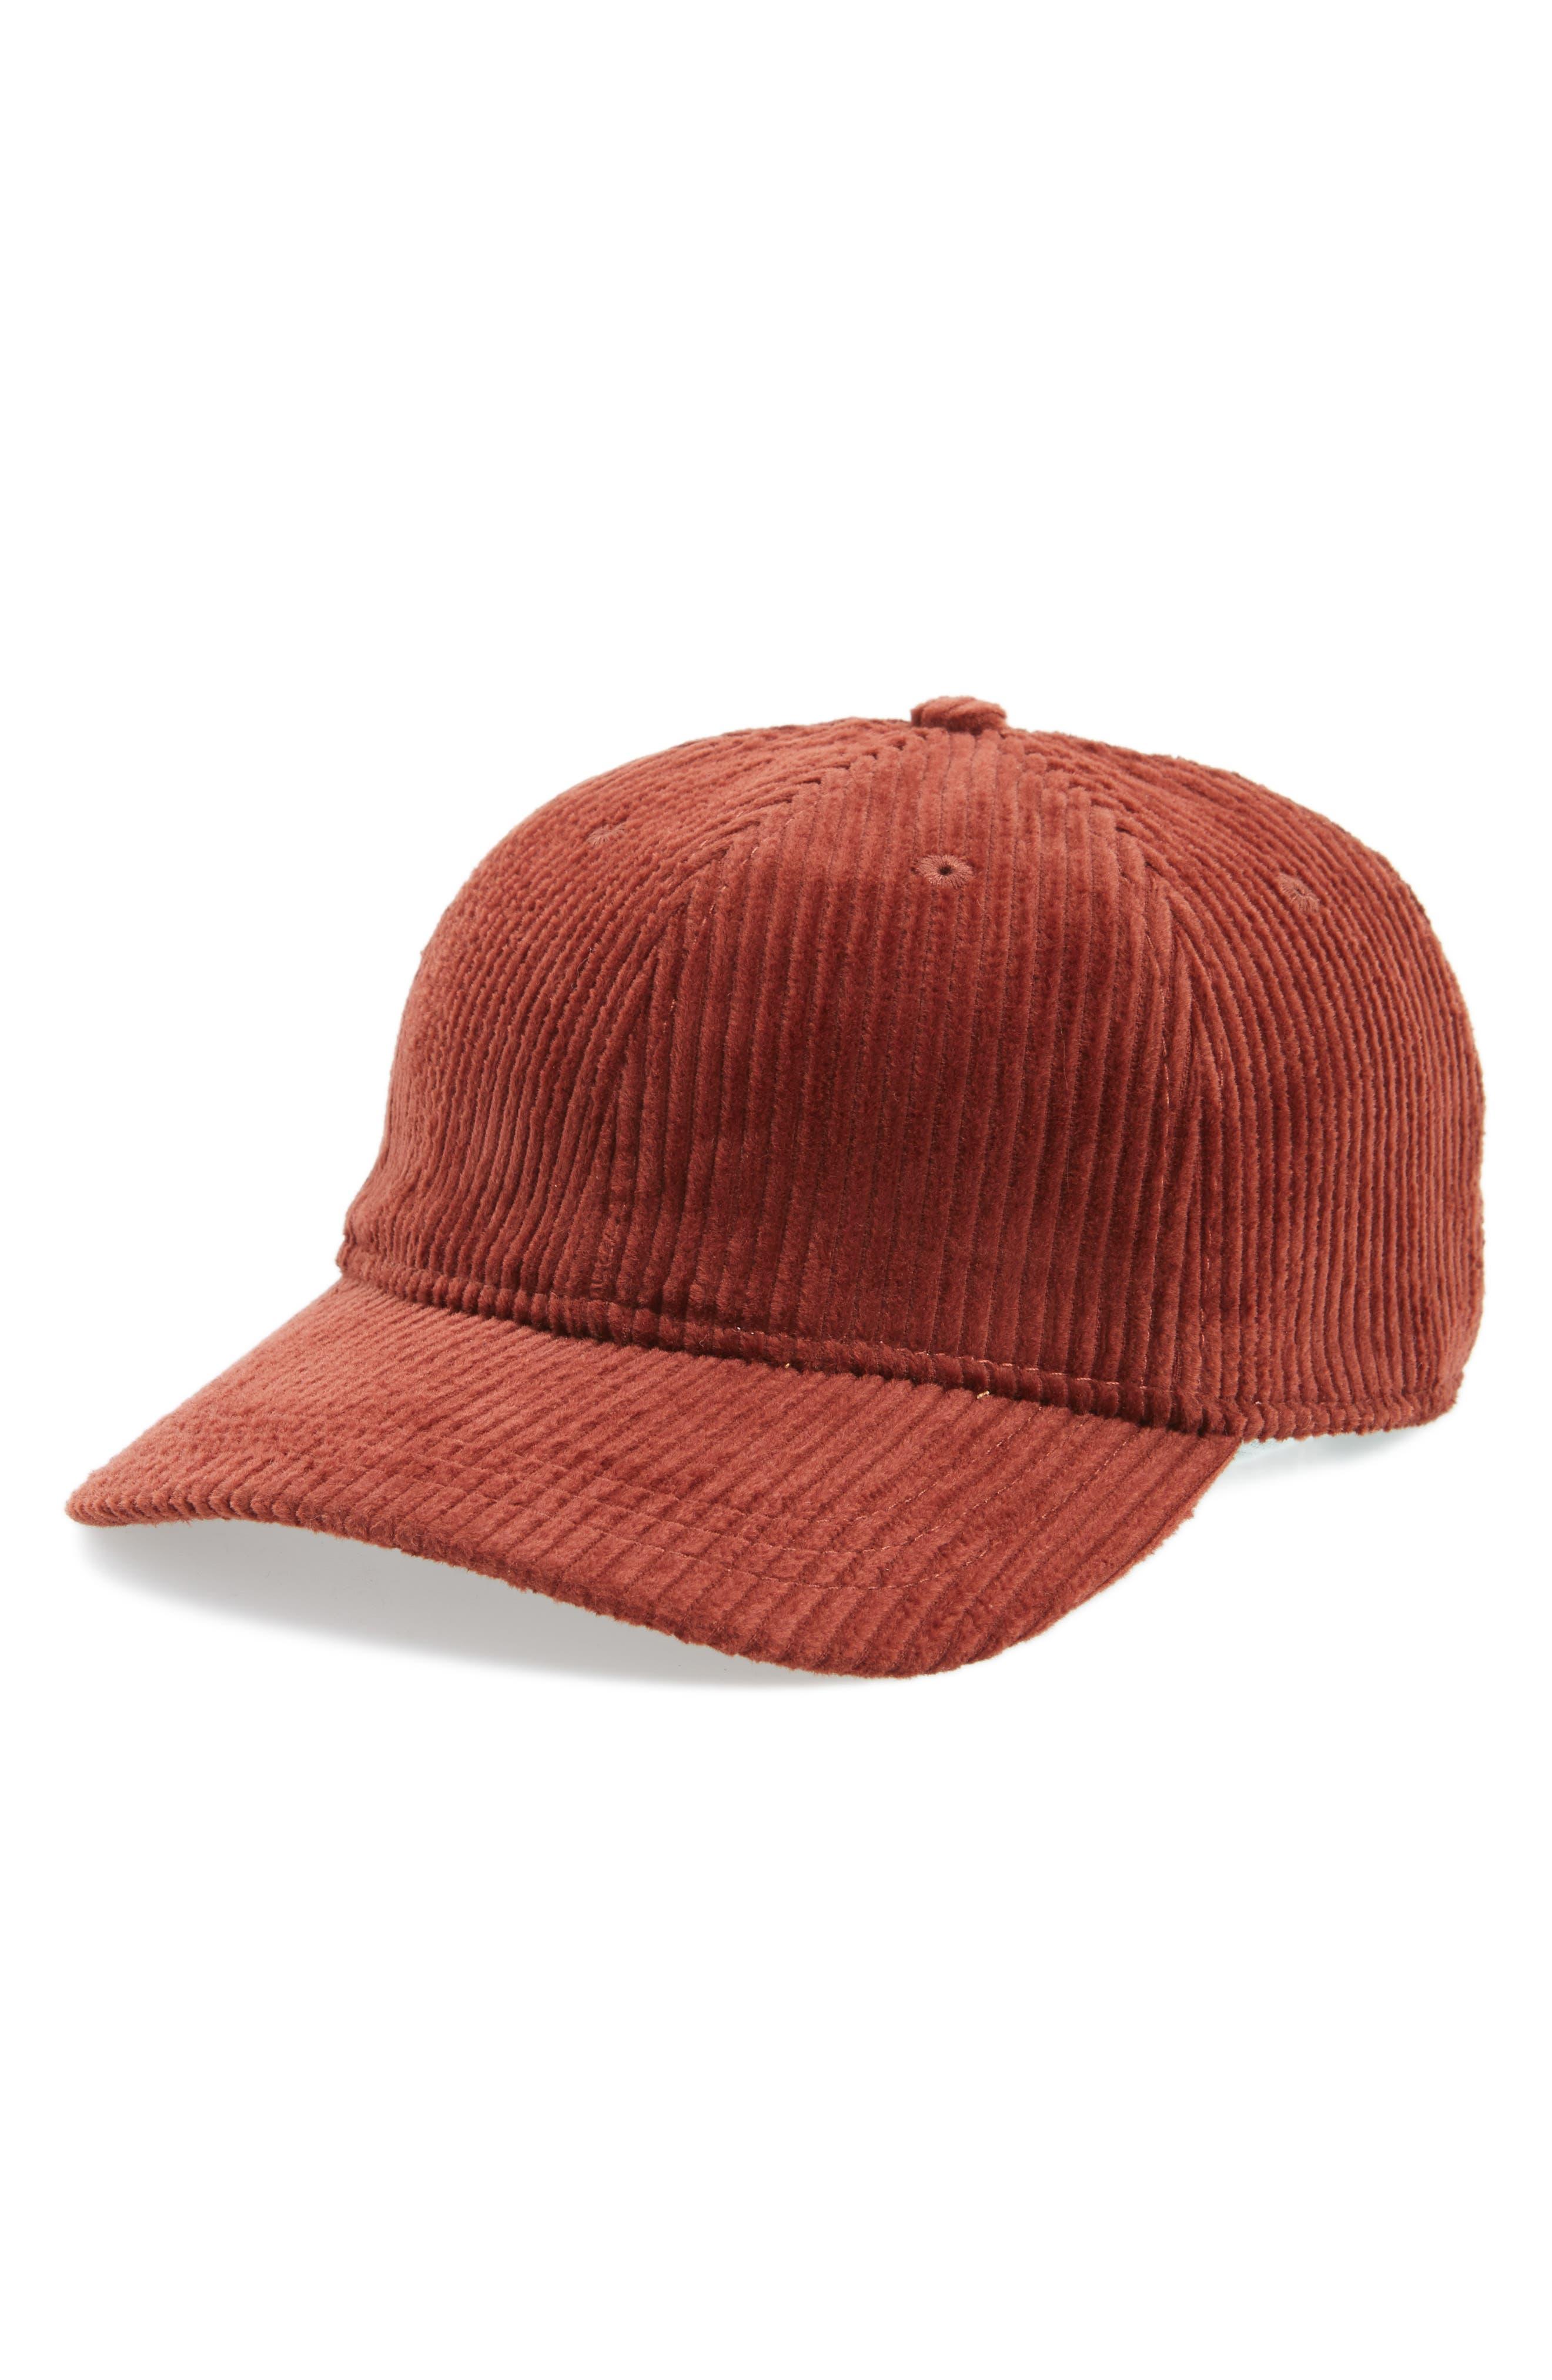 Corduroy Baseball Cap,                         Main,                         color, Burnished Mahogany